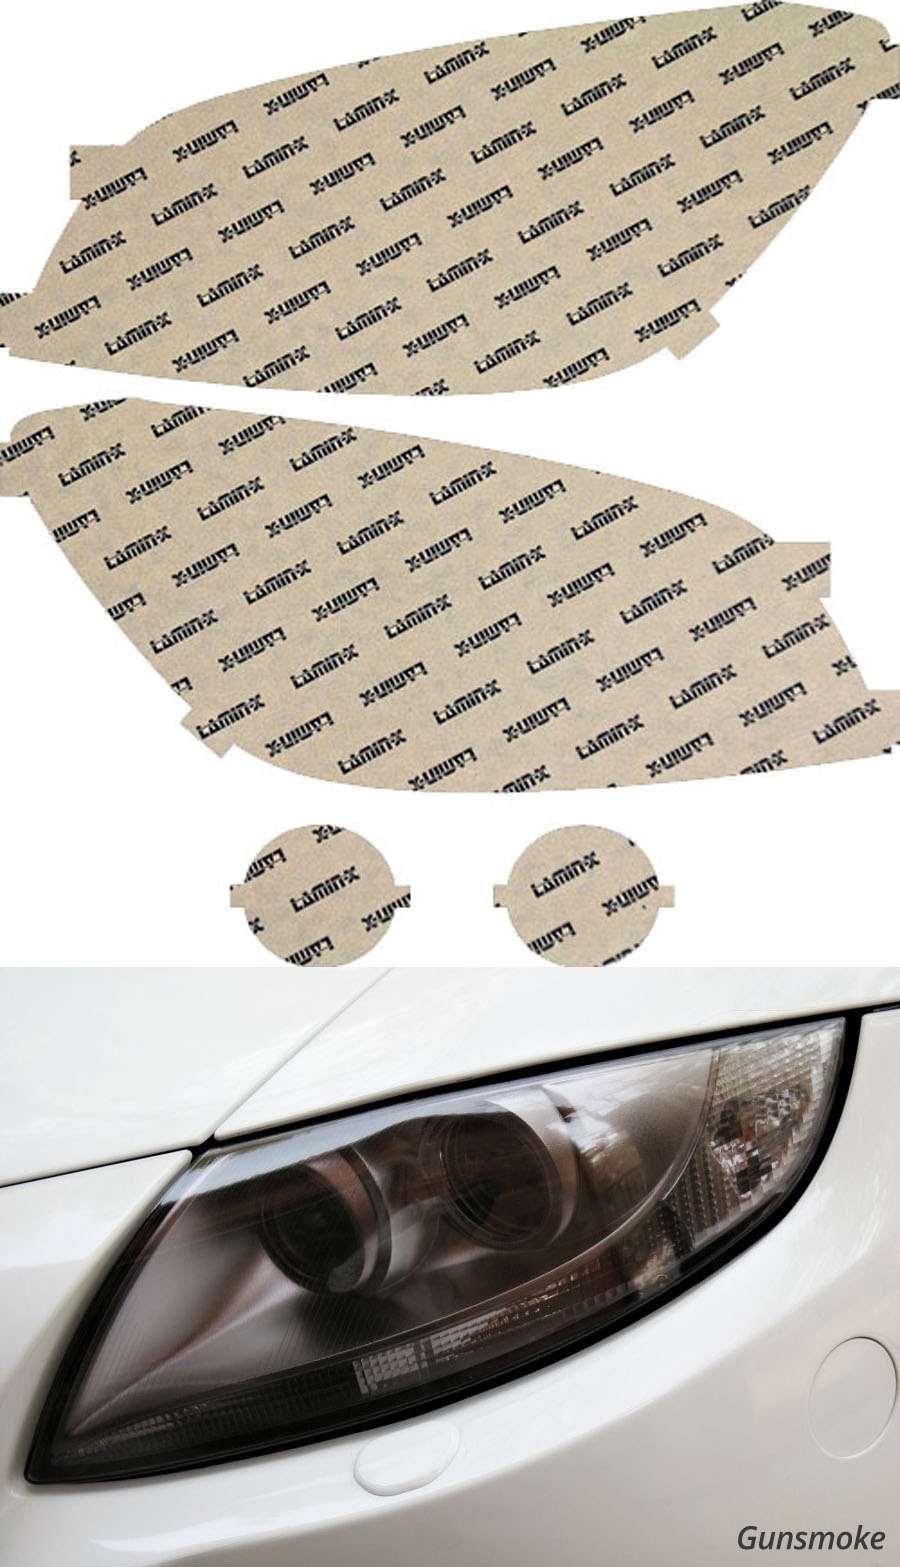 Toyota Rav4 09-12 Gunsmoke Headlight Covers Lamin-X T022G